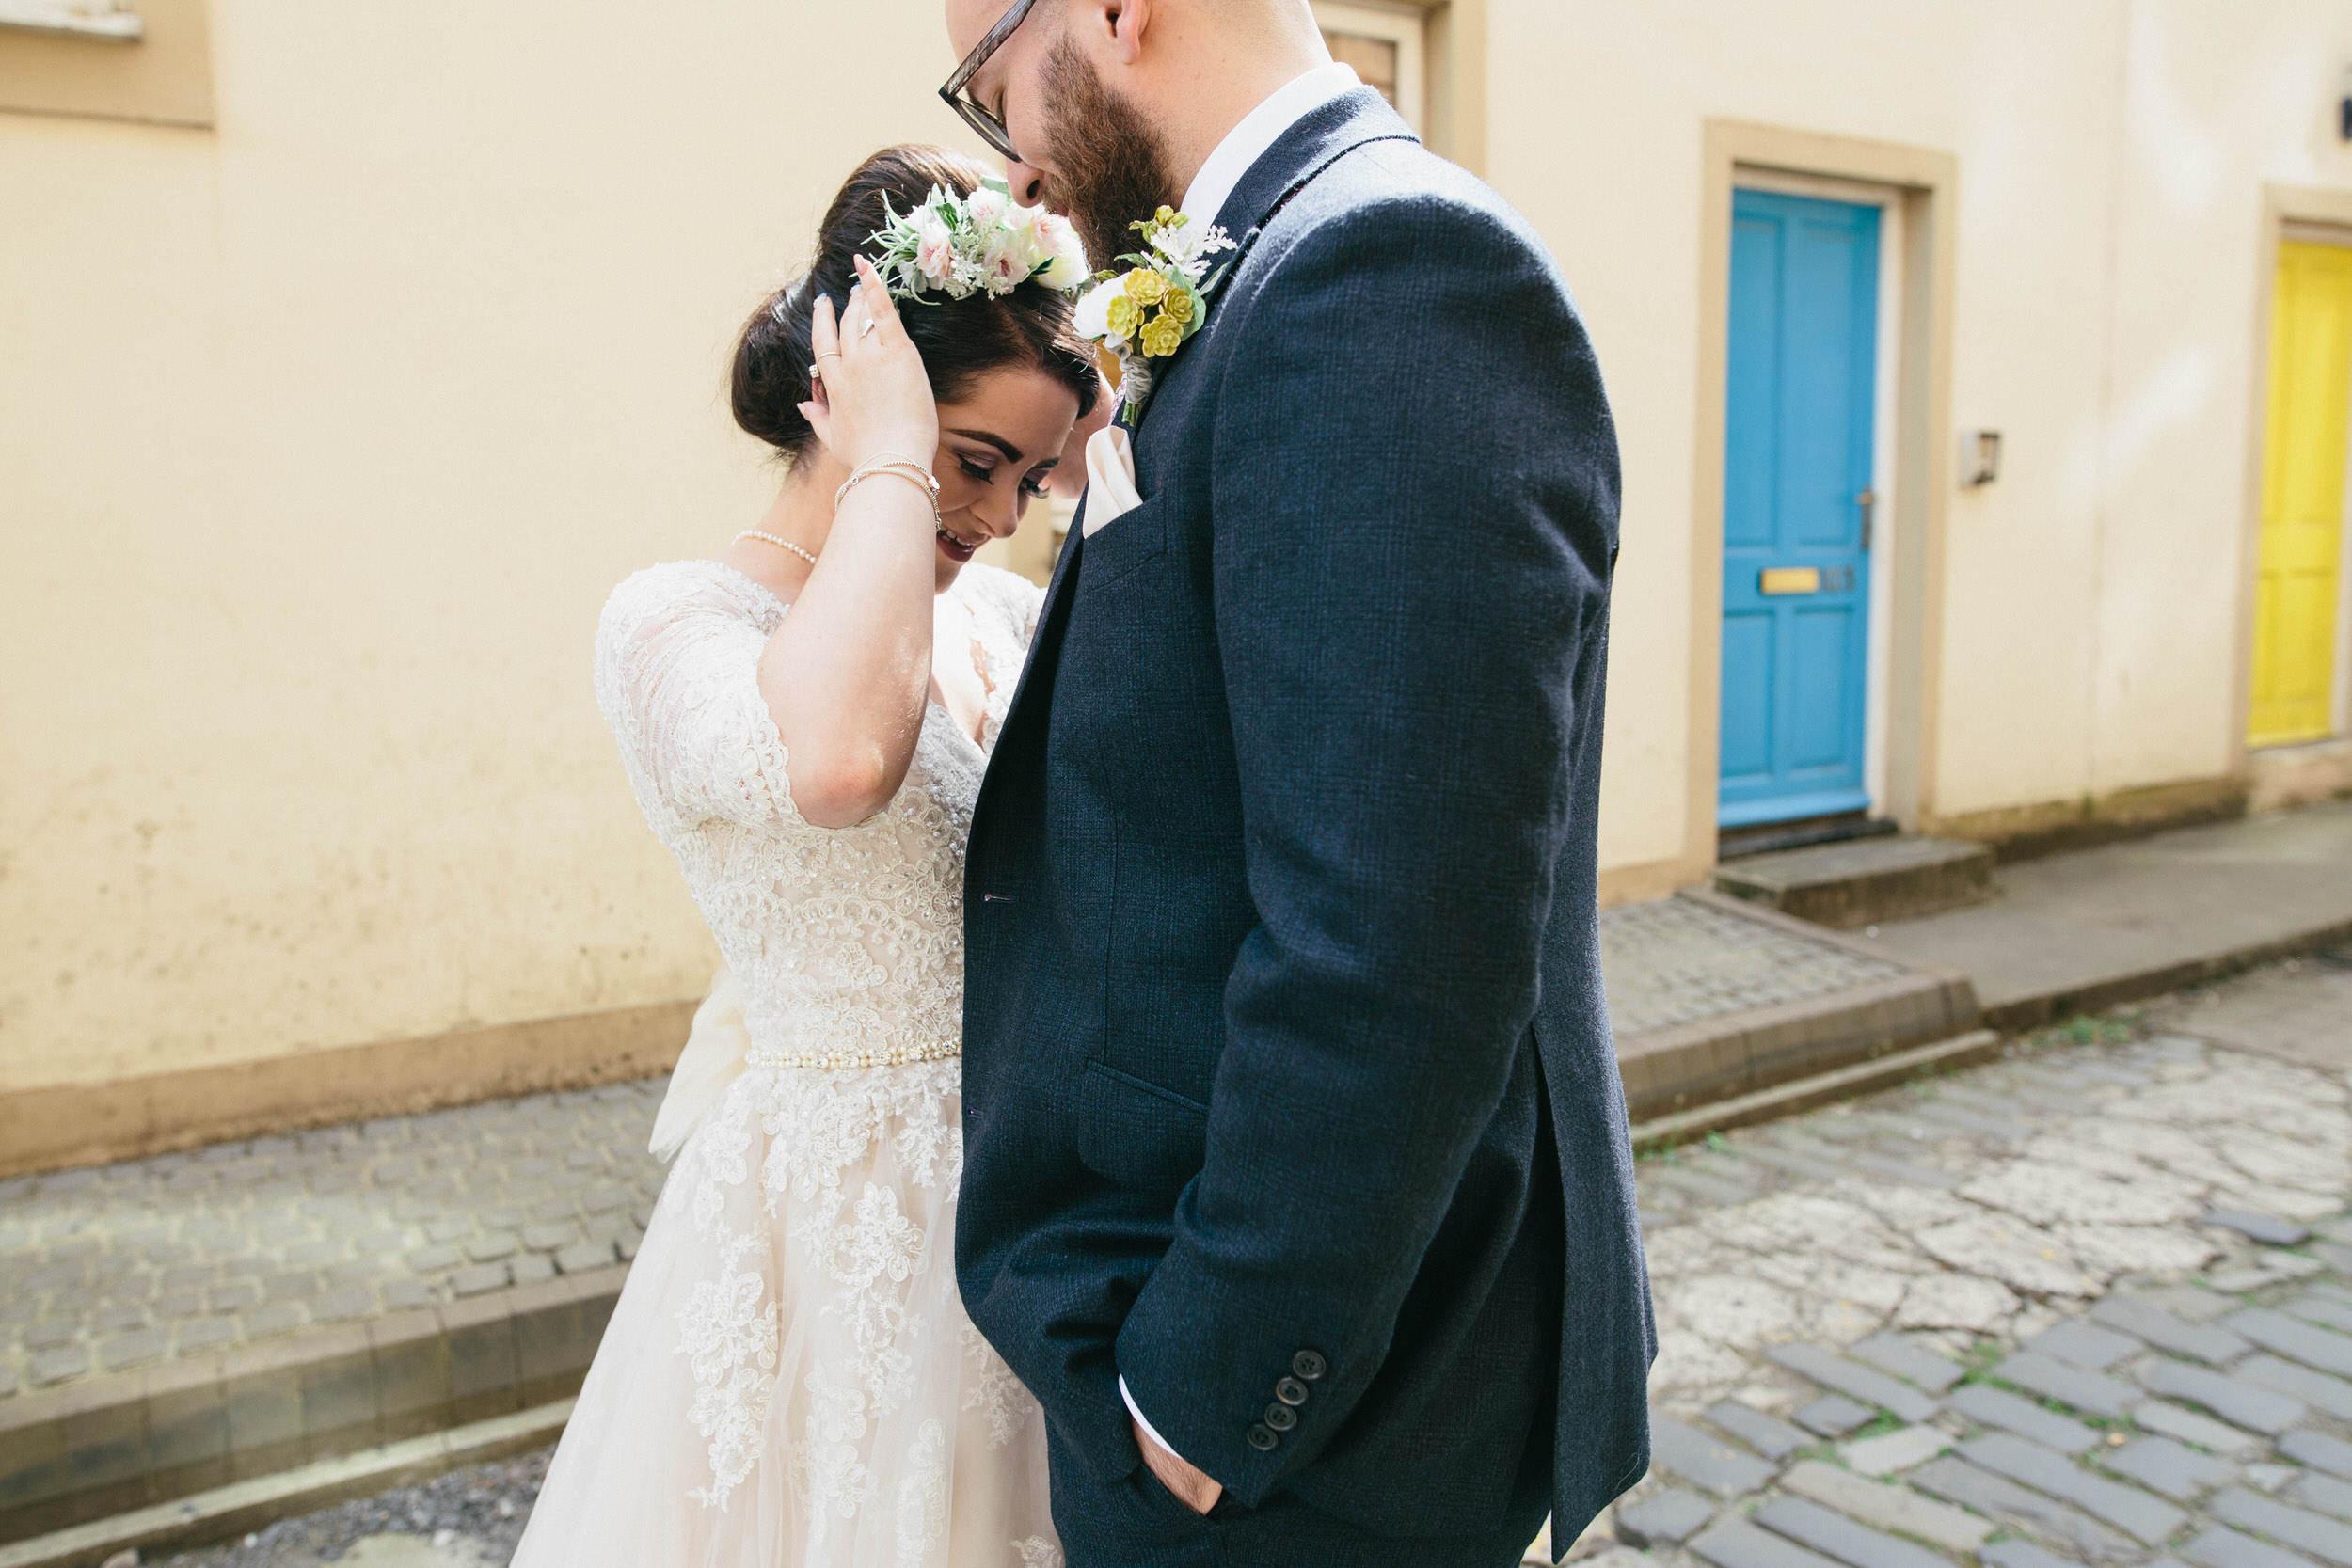 Quirky Wedding Photographer Scotland Glasgow Edinburgh Mirrorbox 159.jpg